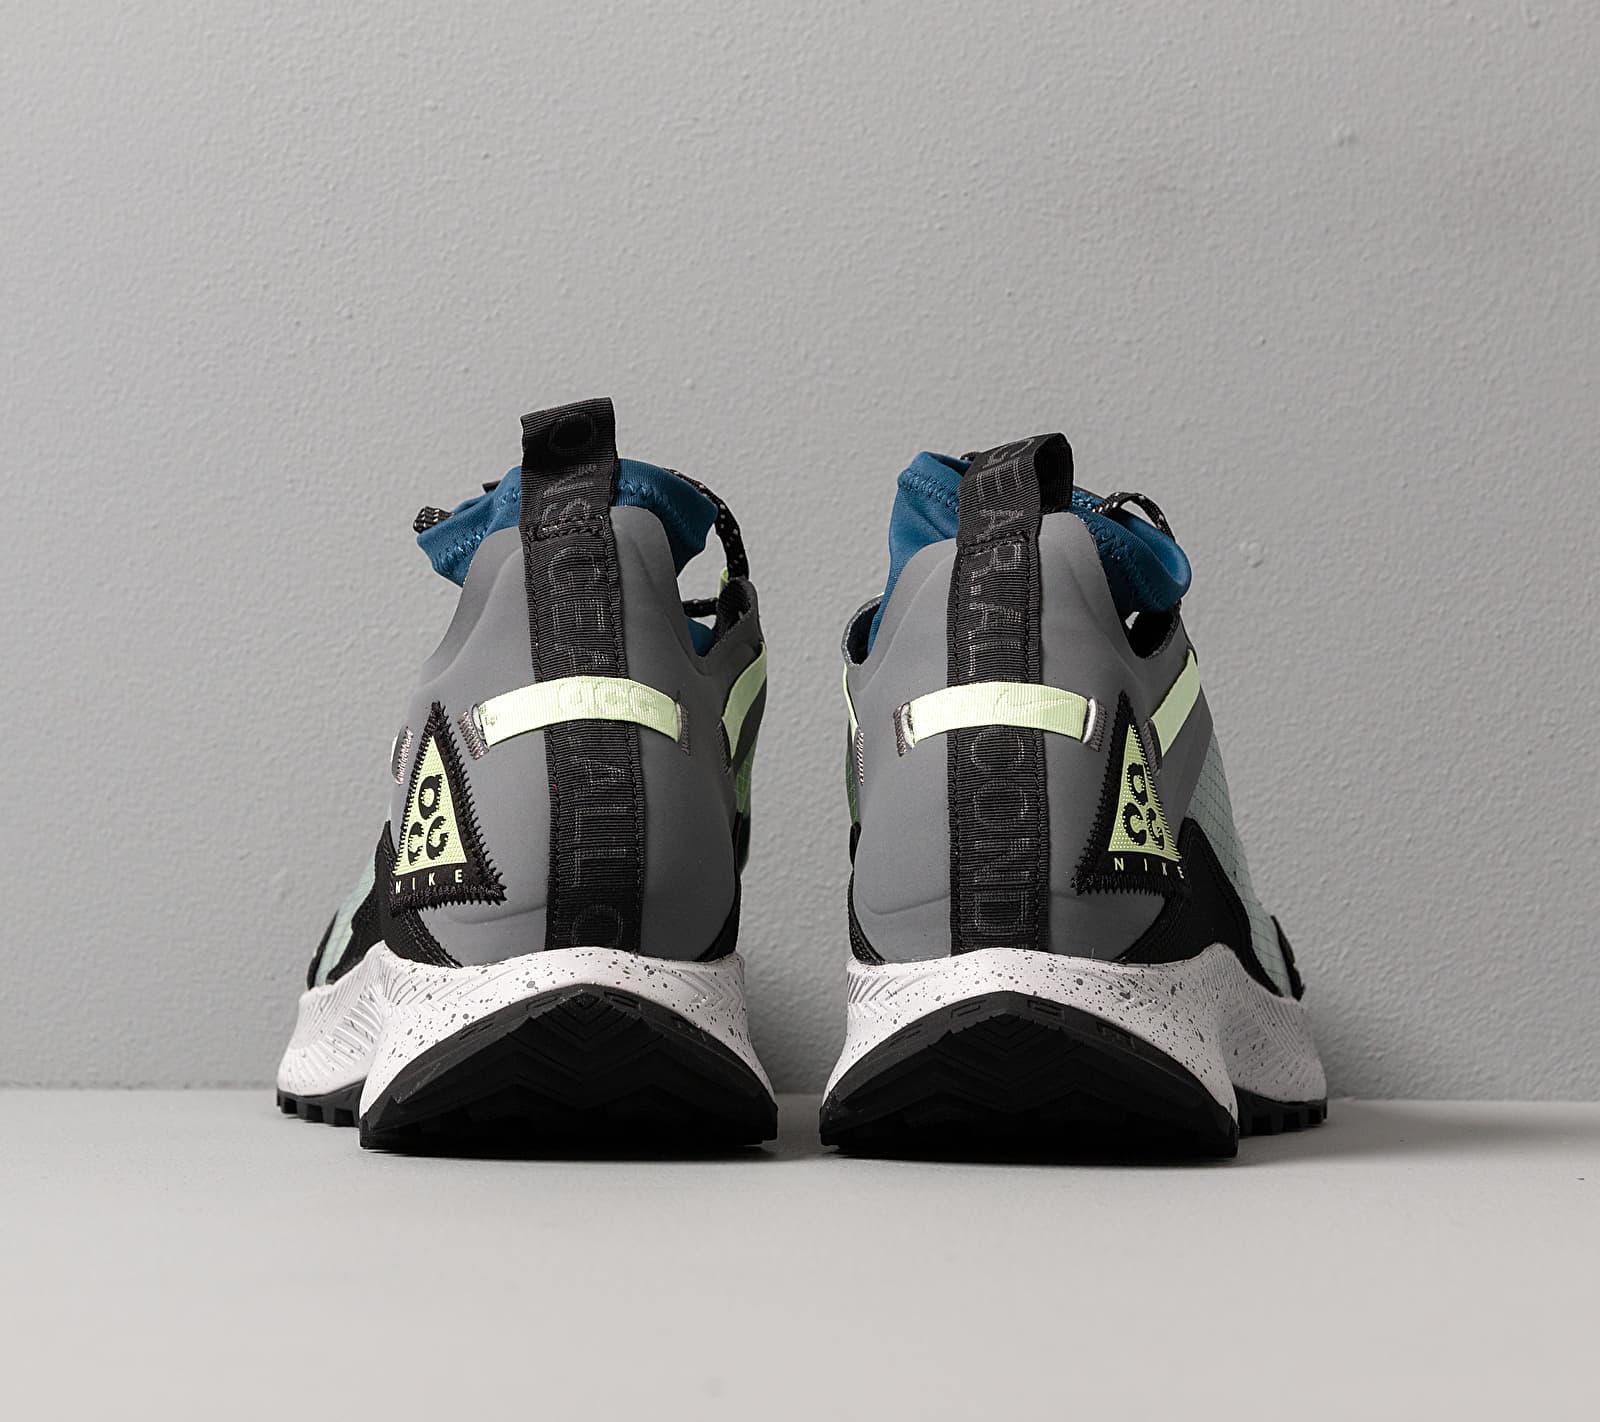 Nike ACG Zoom Terra Zaherra Aviator Grey/ Barely Volt-Vast Grey, Gray